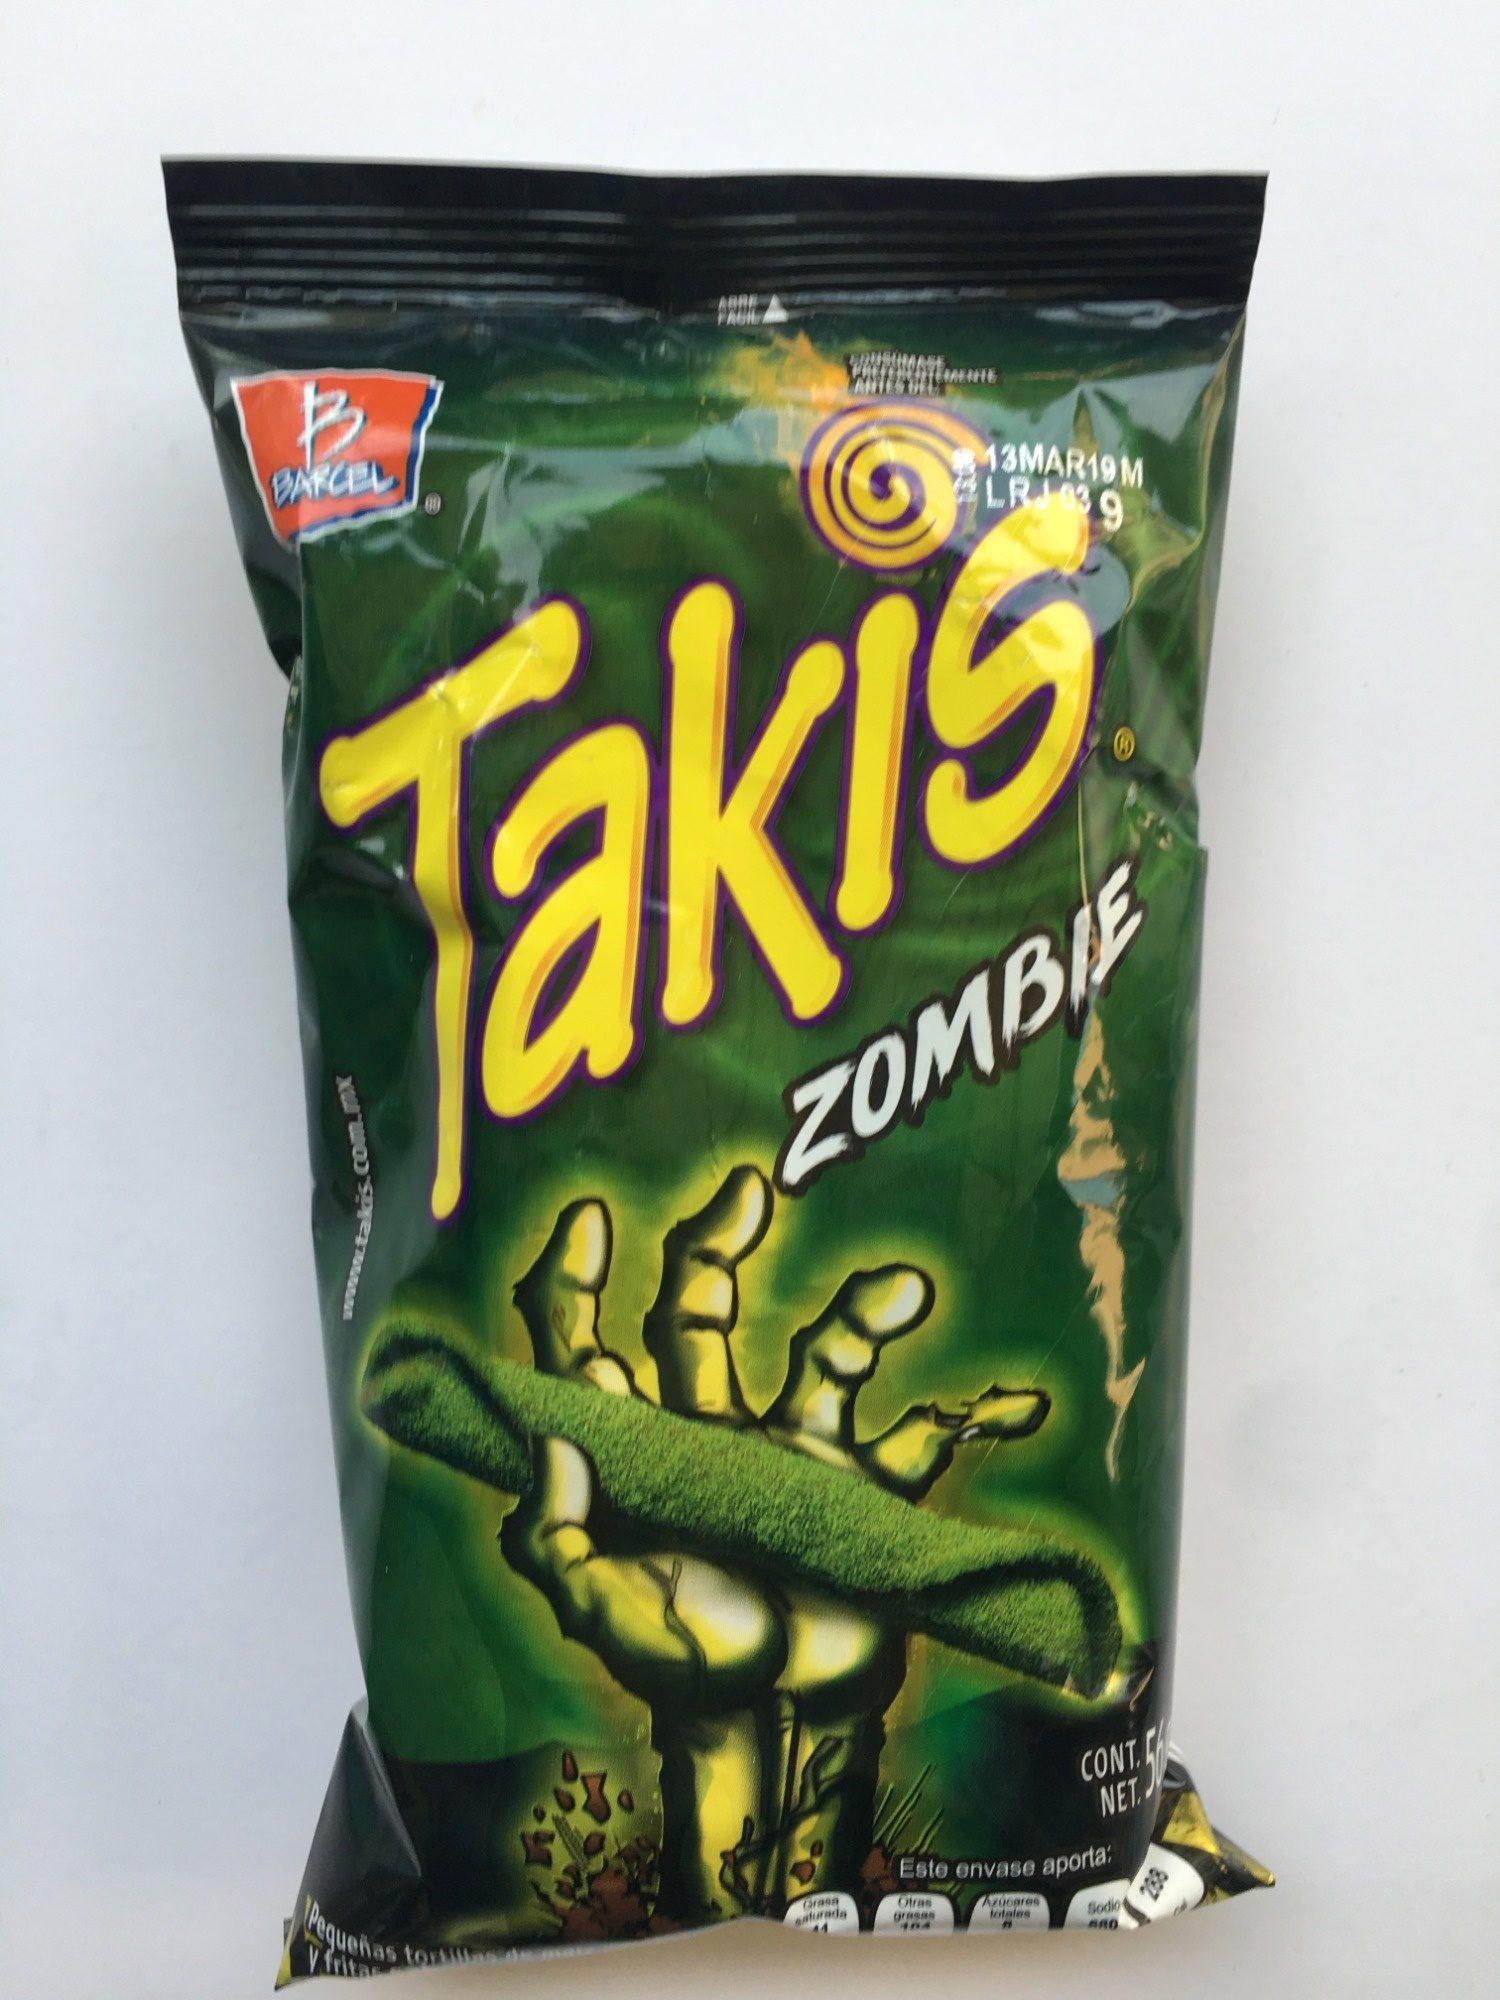 Zombie Takis